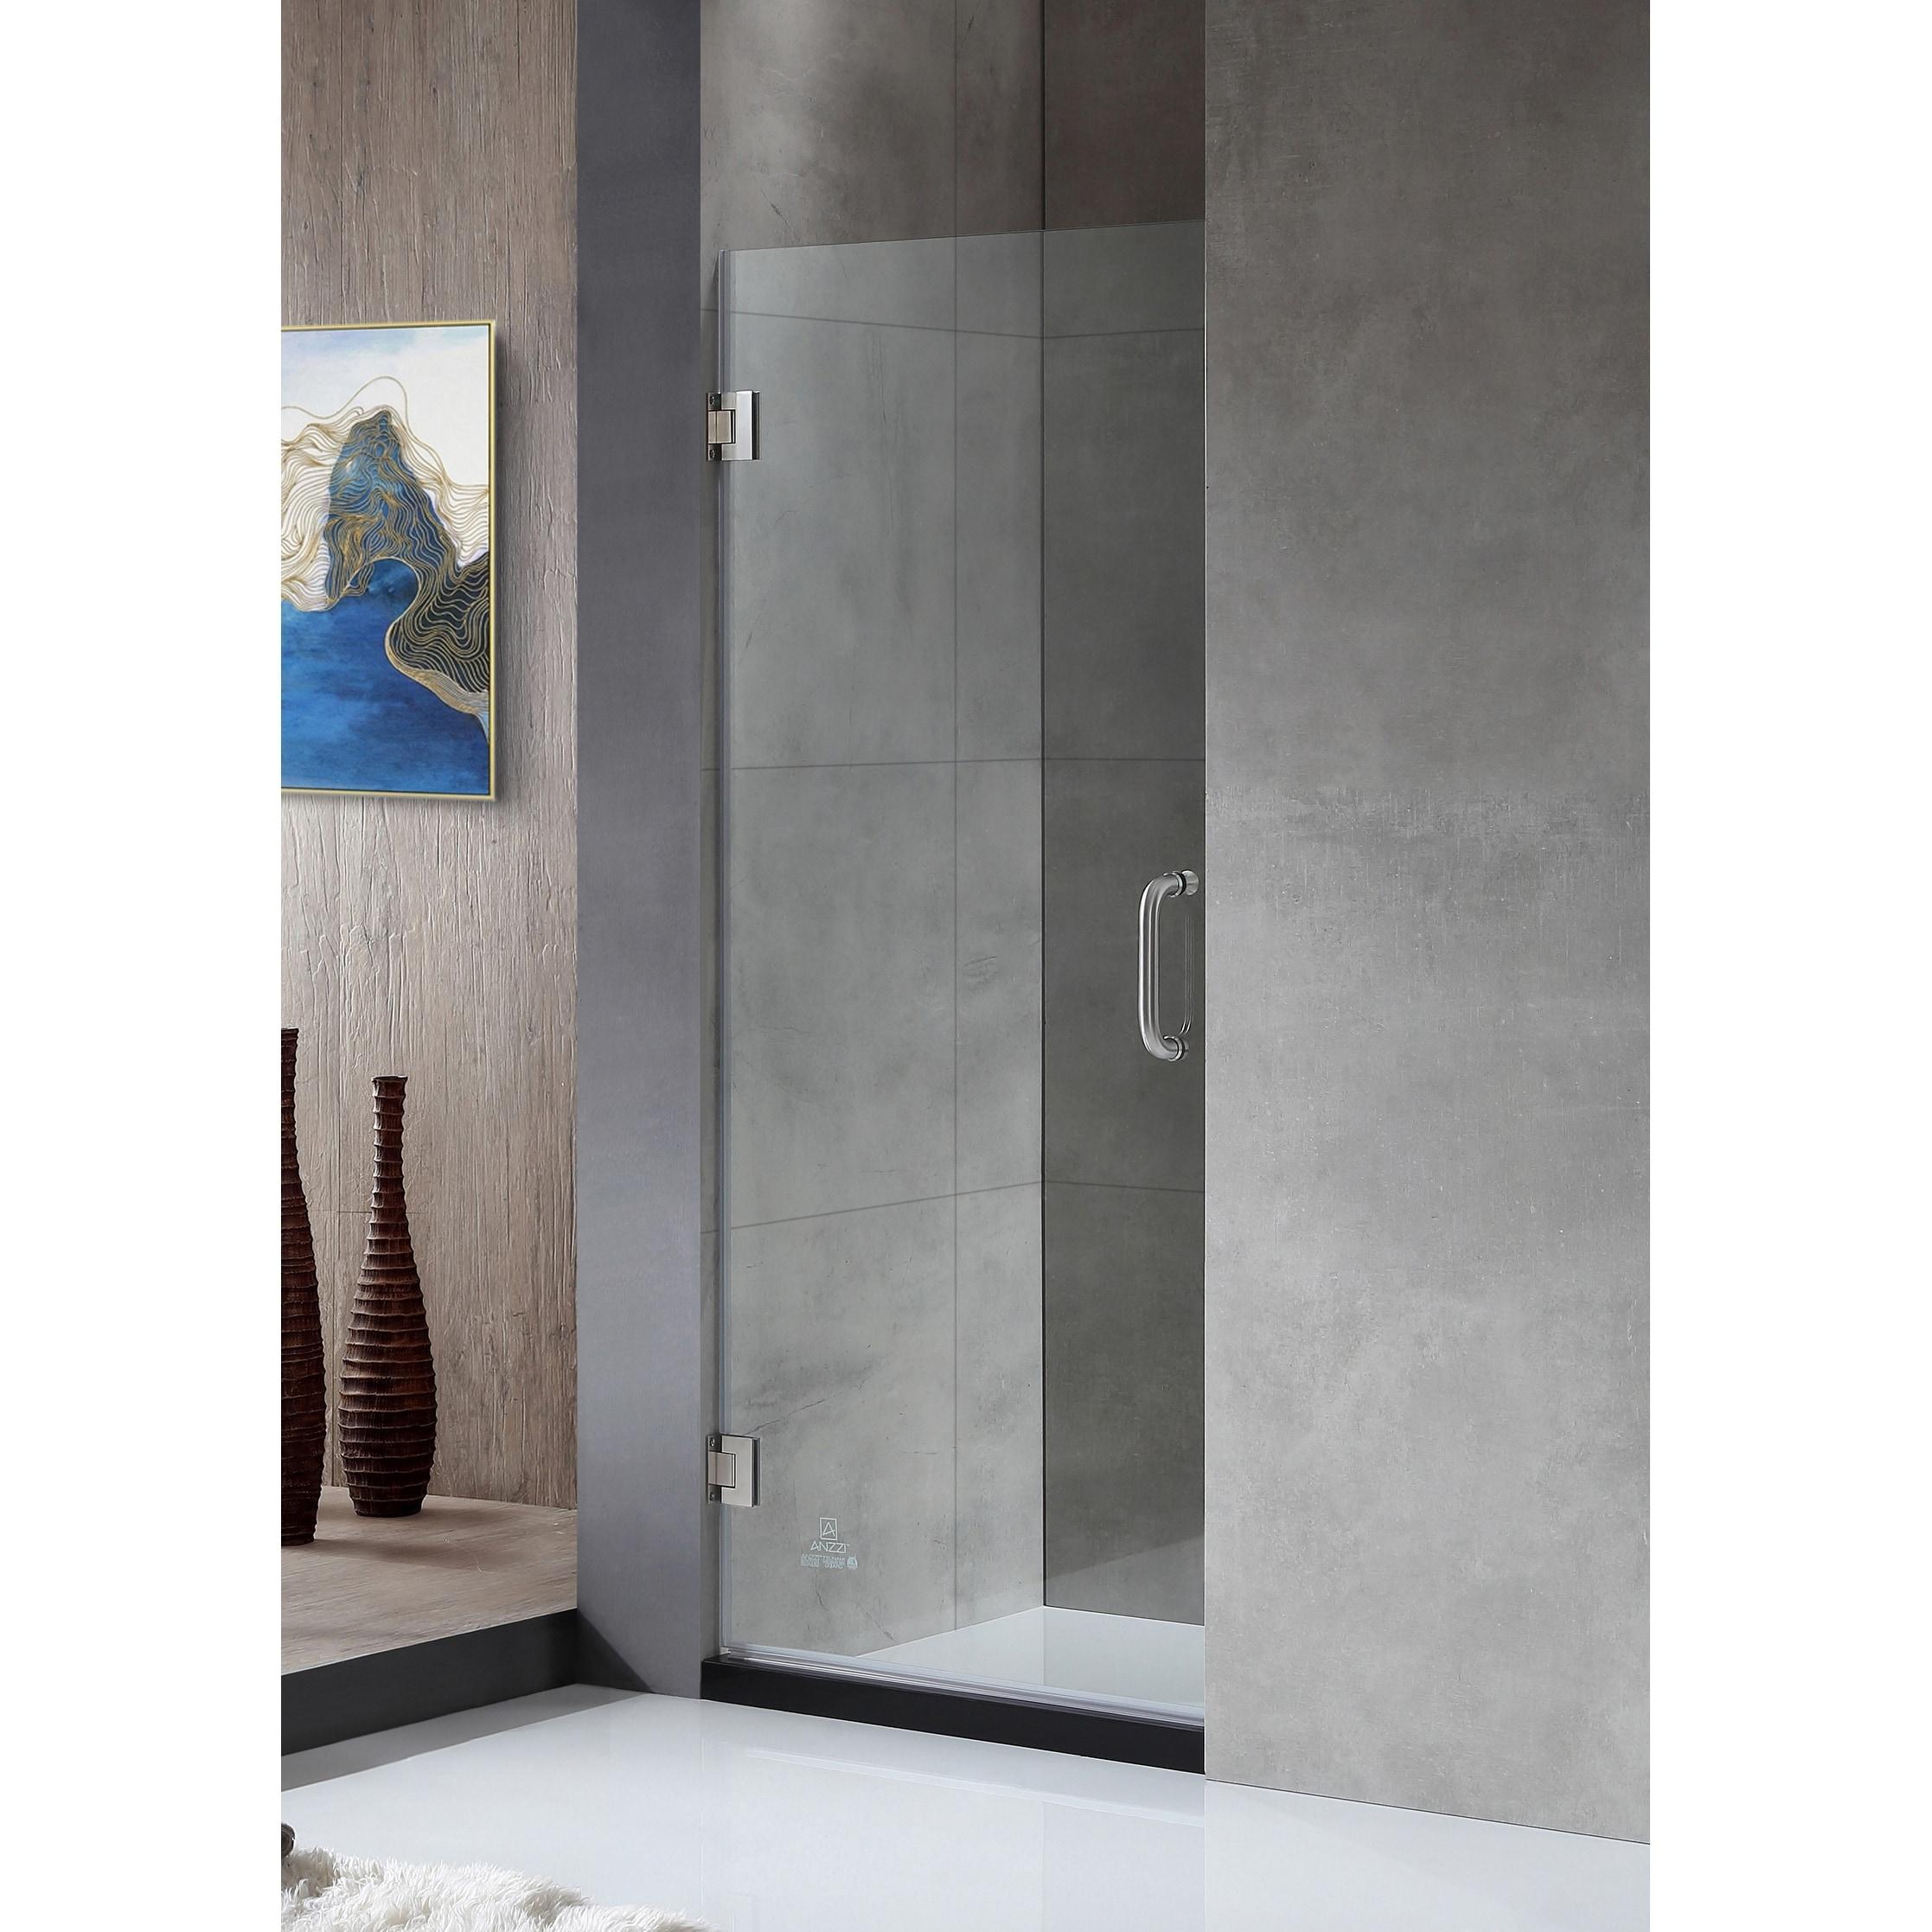 Anzzi Fellow 24 X 72 Frameless Hinged Shower Door In Brushed Nickel